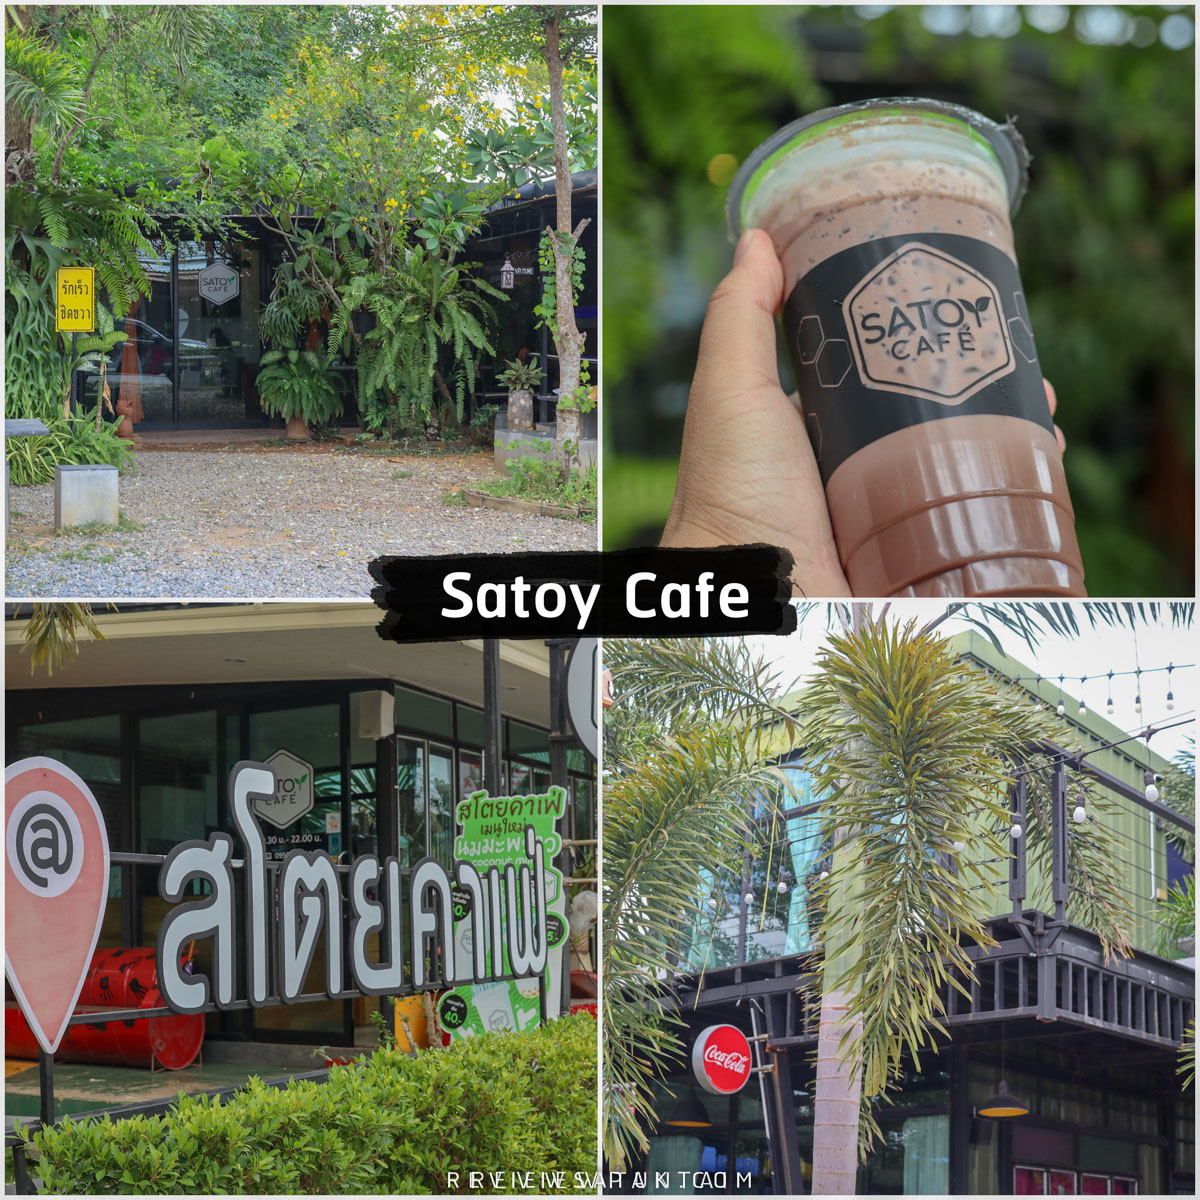 Satoy-Cafe--คาเฟ่บรรยากาศร้านนั่งสบายๆ-เมนูอาหารเยอะมีทั้งสเต็ก-สปาเก็ตตี้-ของหวานบิงซู-ไอศกรีม-กาแฟ-บริการดีเยี่ยม-10/10-รายละเอียด-คลิก  จุดเช็คอิน,หลีเป๊ะ,สตูลสดยกกำลังสาม,satunwonderland,เที่ยวเมืองไทยAmazingกว่าเดิม,ชีพจรลงSouth